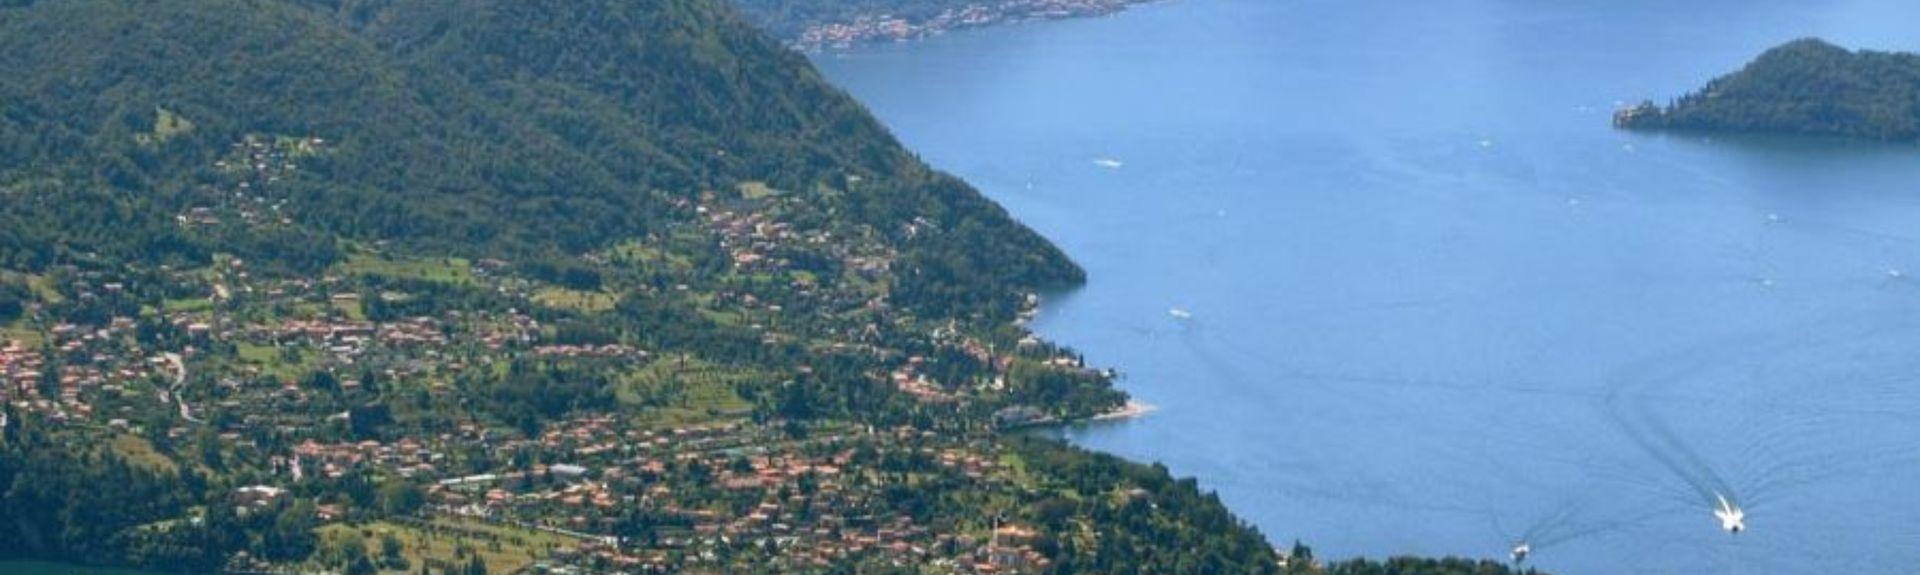 Montorfano, Como, Lombardy, Italy